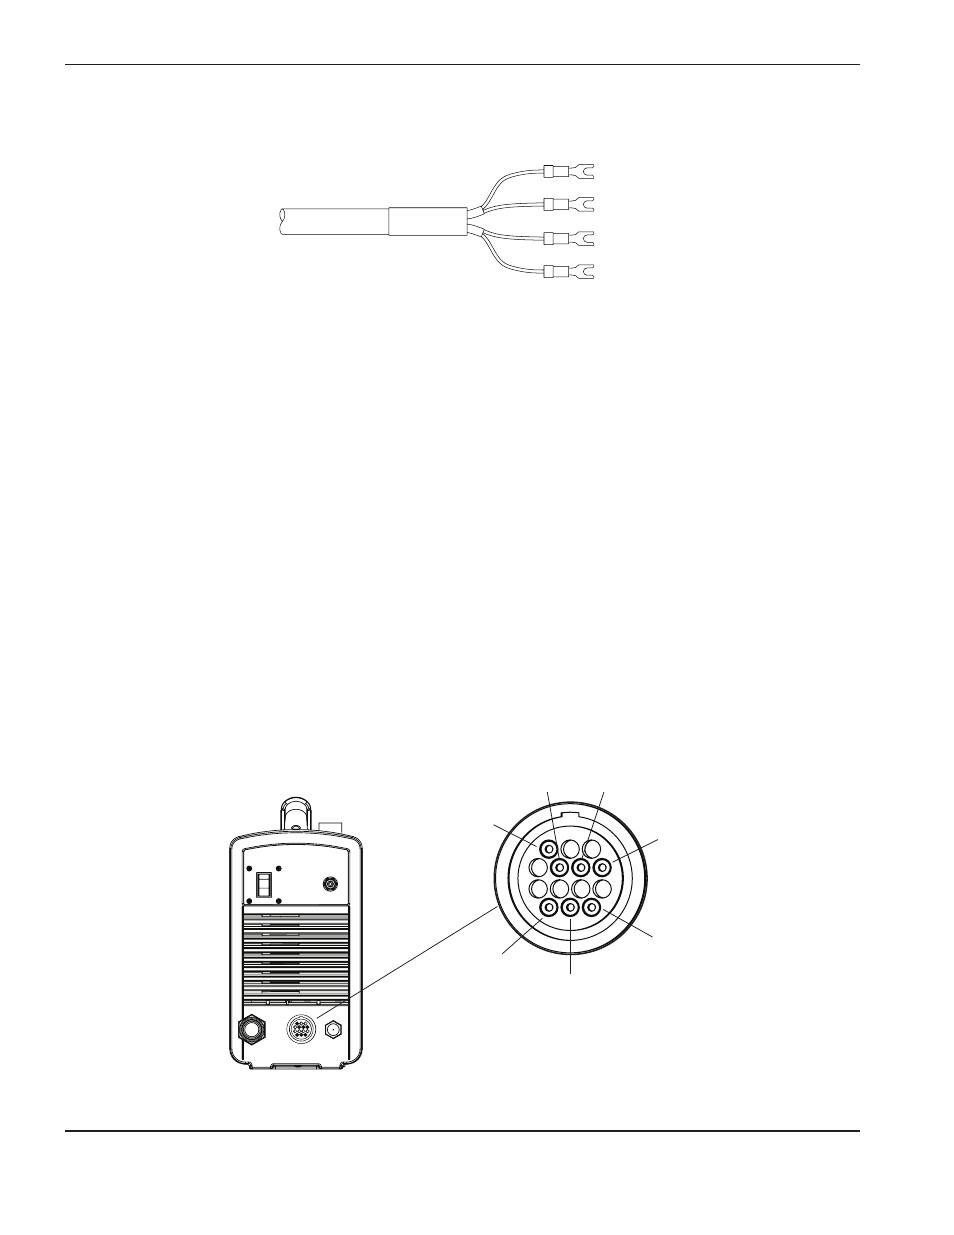 powermax hypertherm powermax45 service manual user manual page rh manualsdir com Hypertherm Powermax 900 Roundup PowerMAX Mix